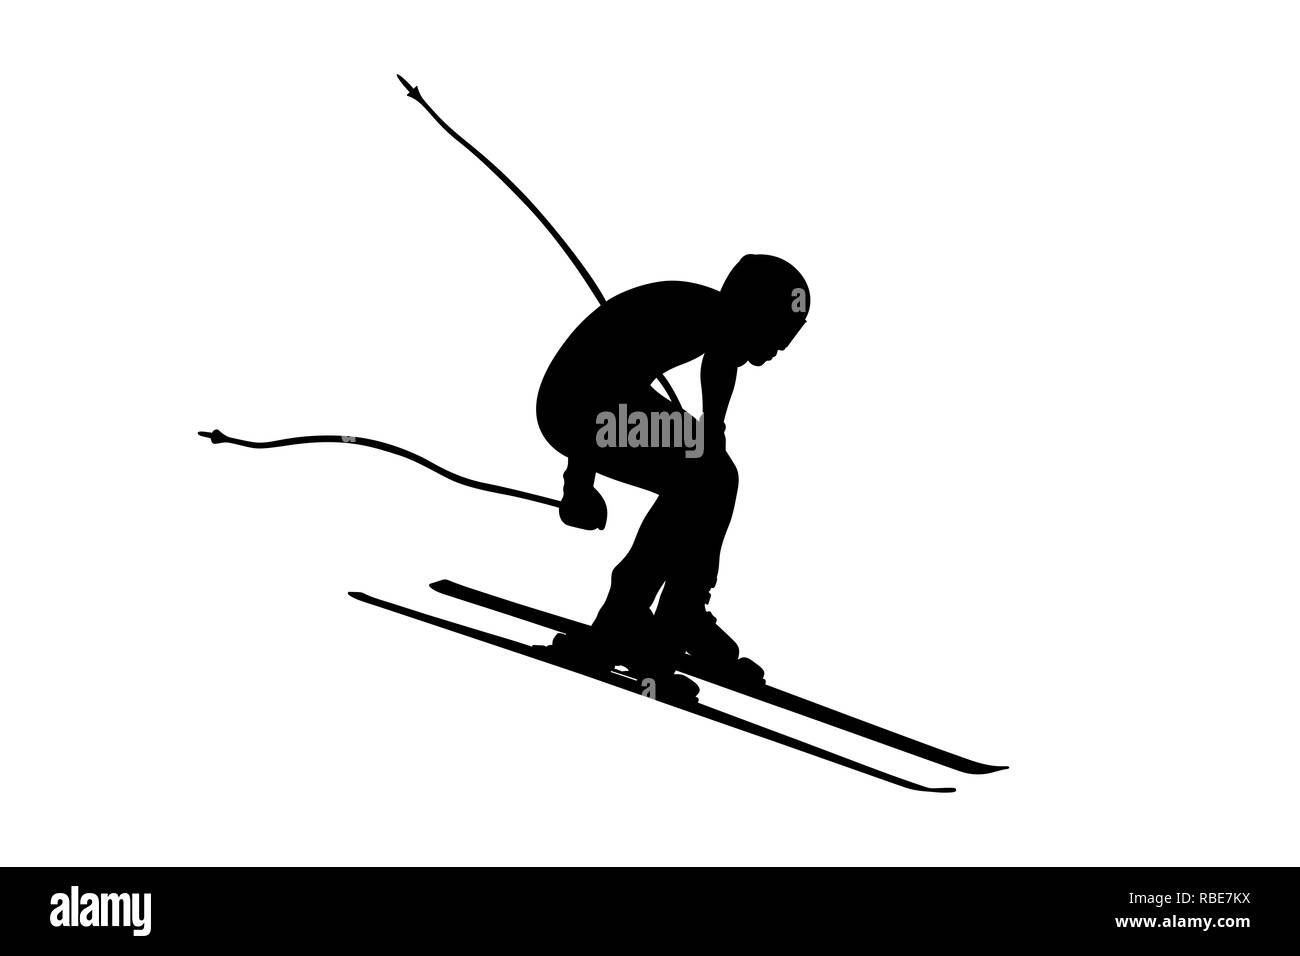 alpine skiing men downhill jump vector illustration - Stock Image